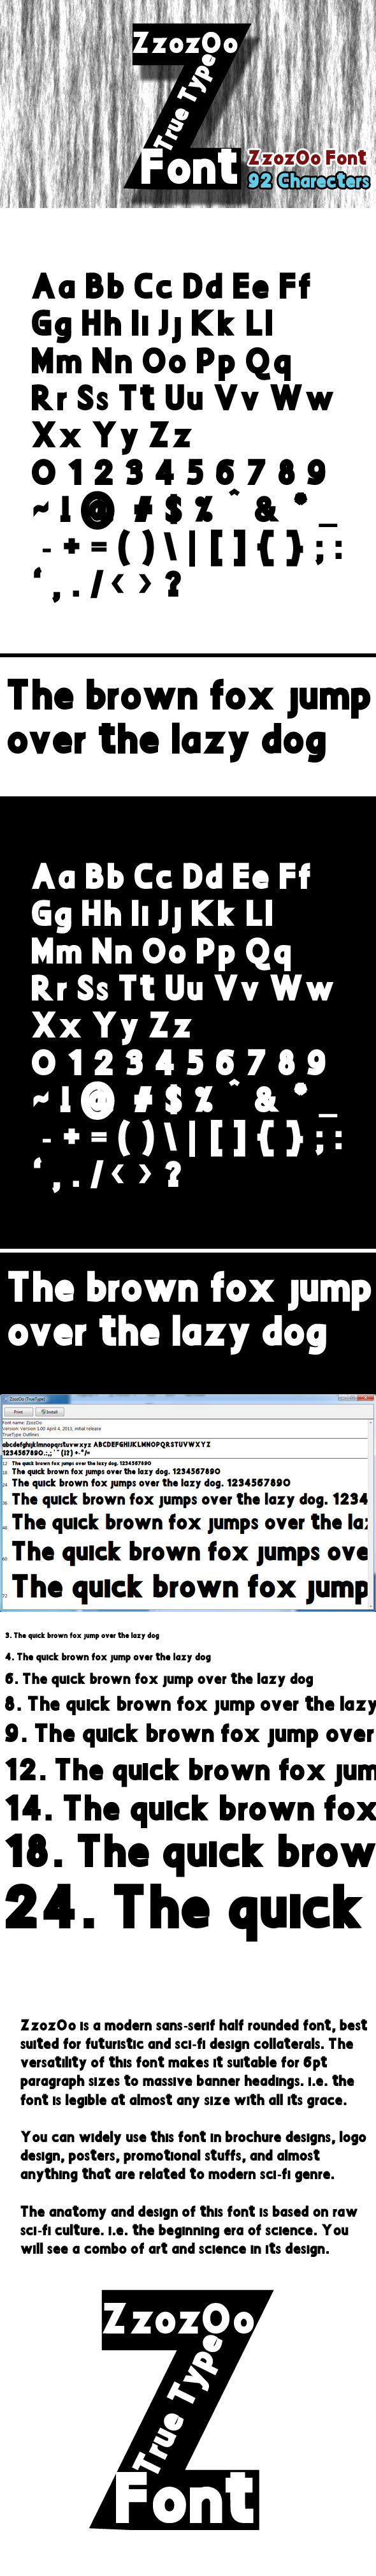 Zzozoo Font - Sans-Serif Fonts